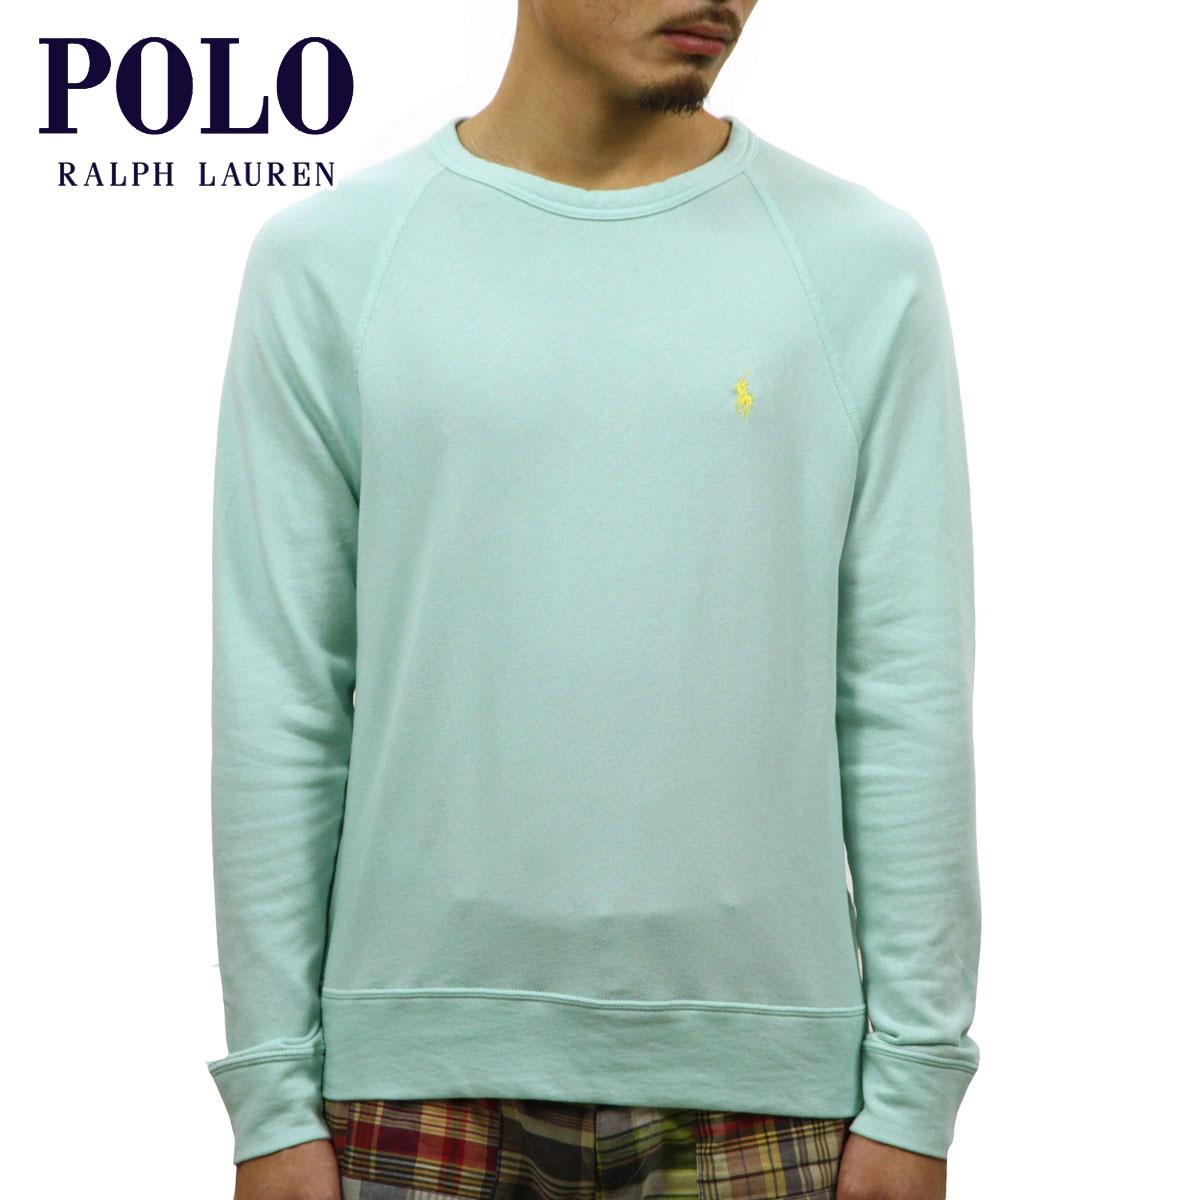 ae924aefb Polo Ralph Lauren POLO RALPH LAUREN regular article men sweat shirt COTTON SPA  TERRY SWEATSHIRT ...